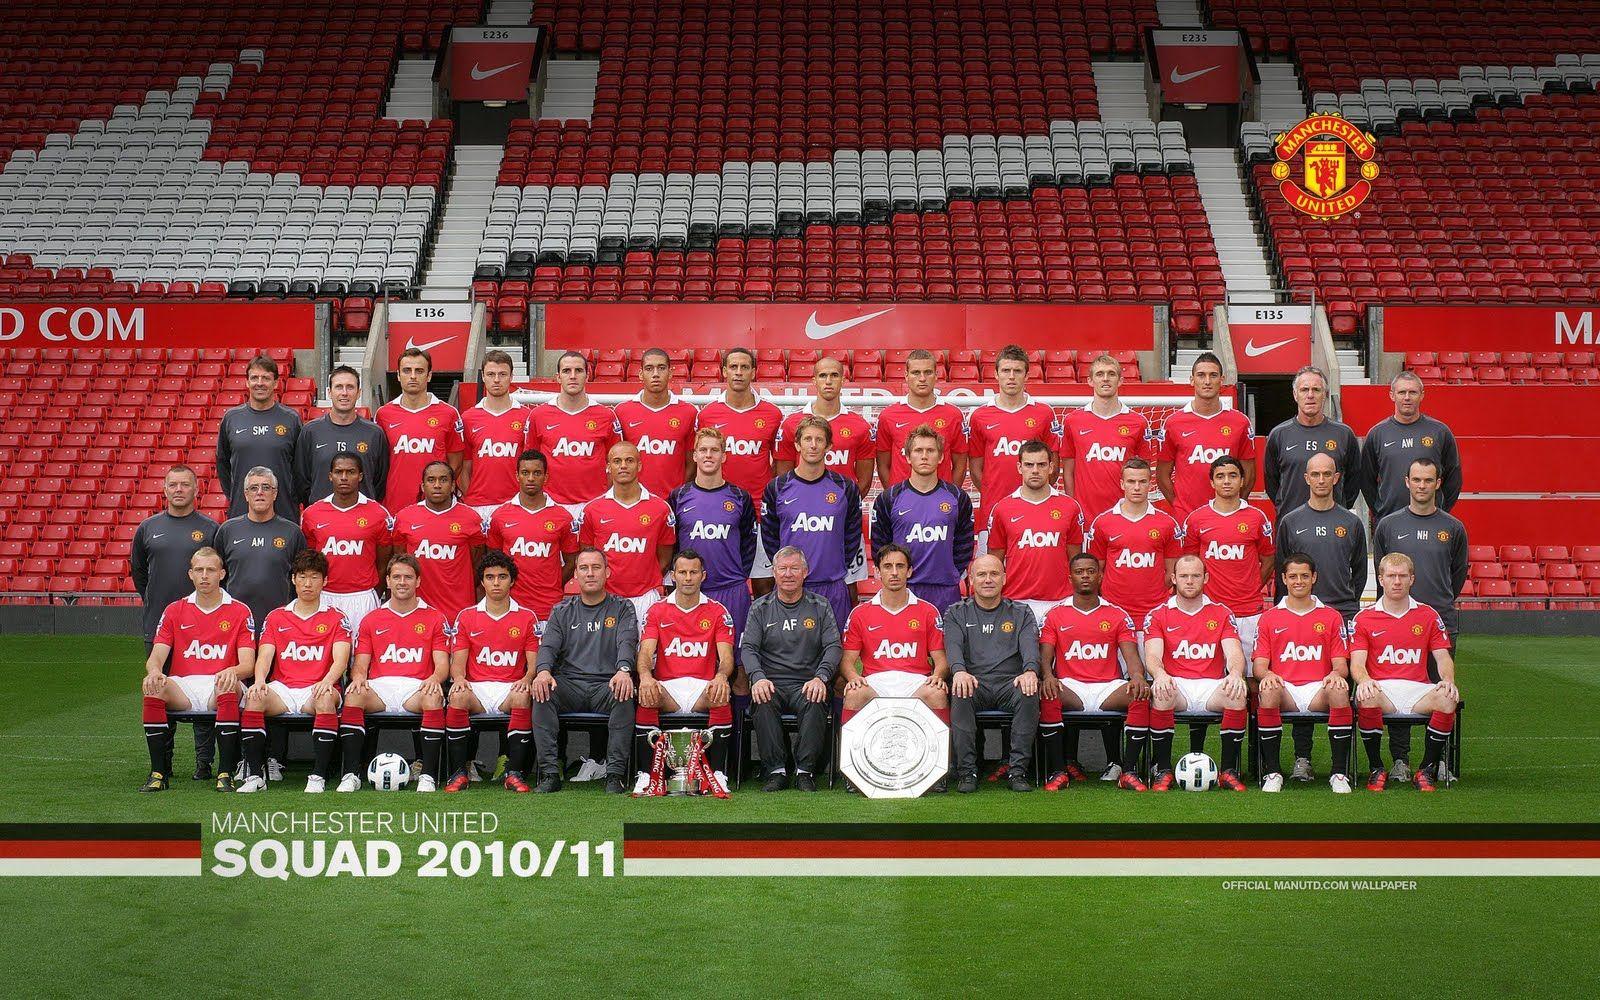 2010/11 Manchester United Squad